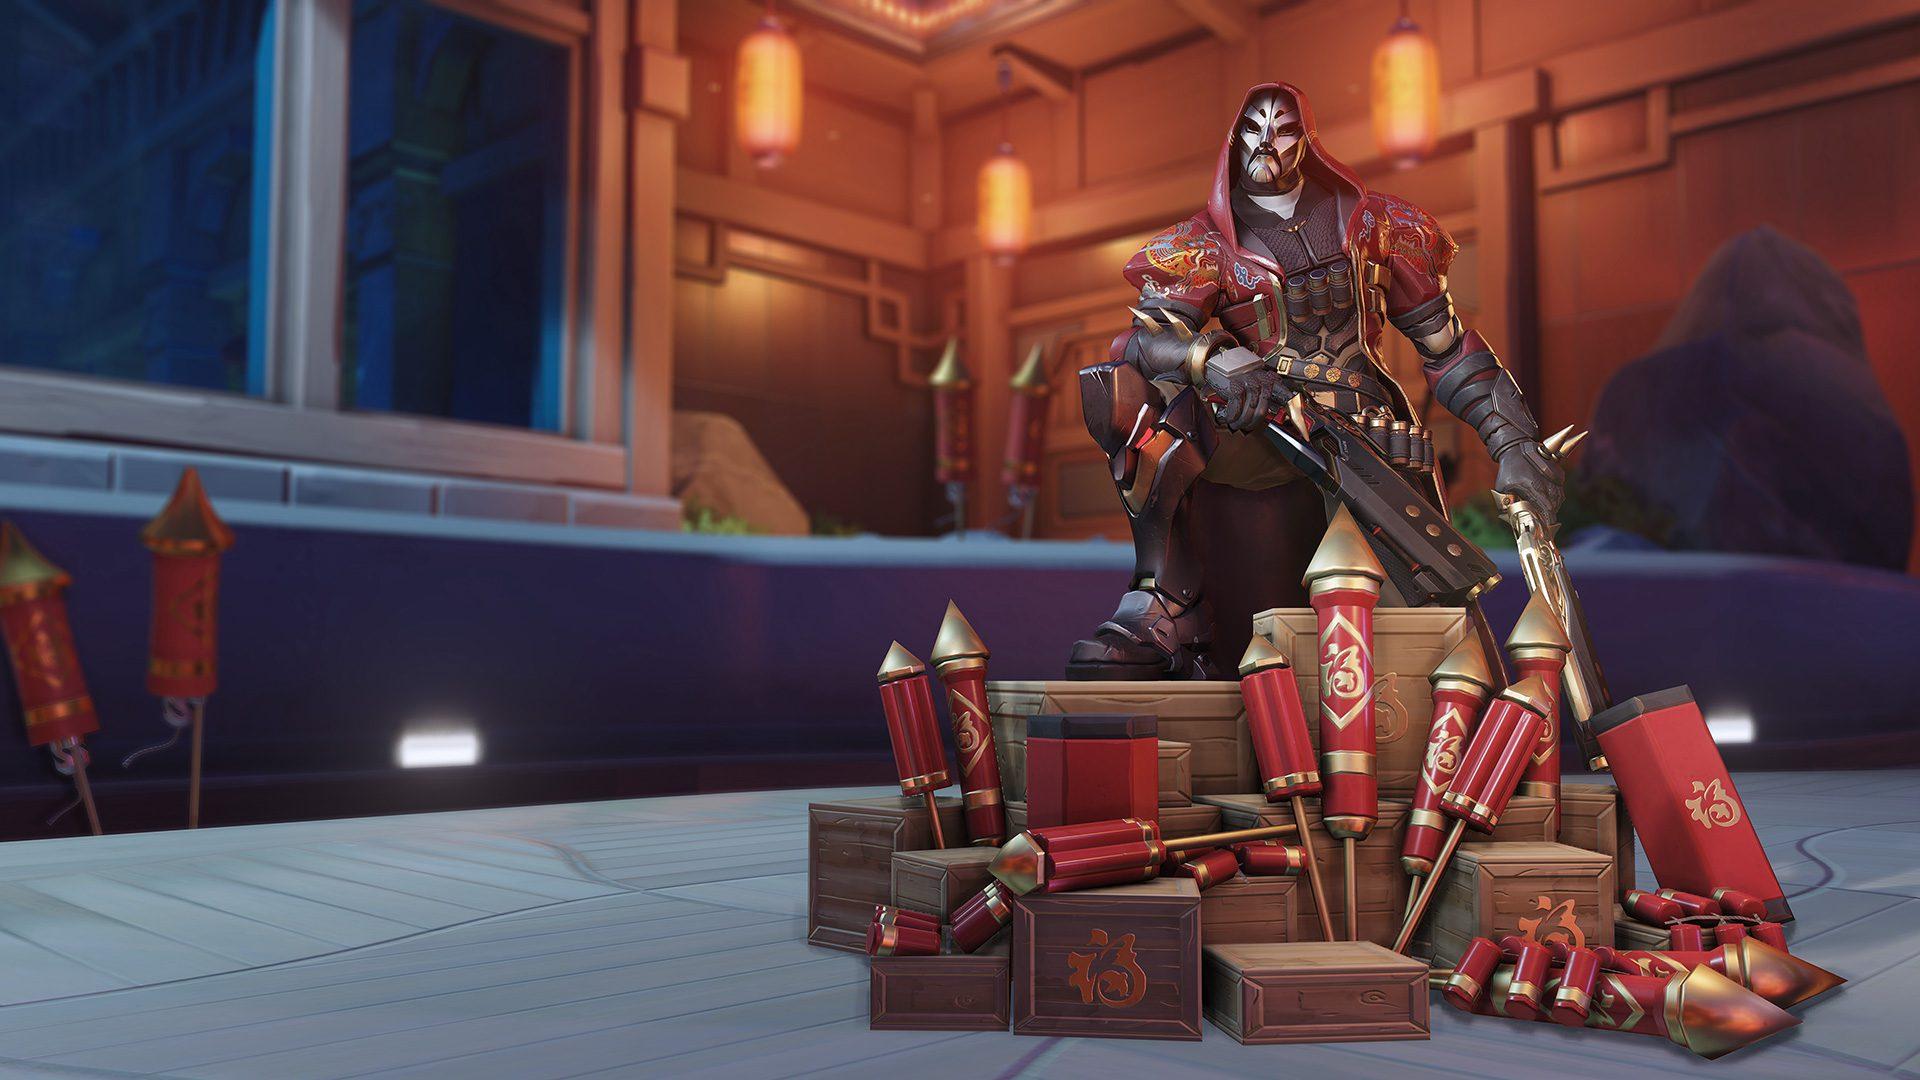 Imperial Guard Reaper skin